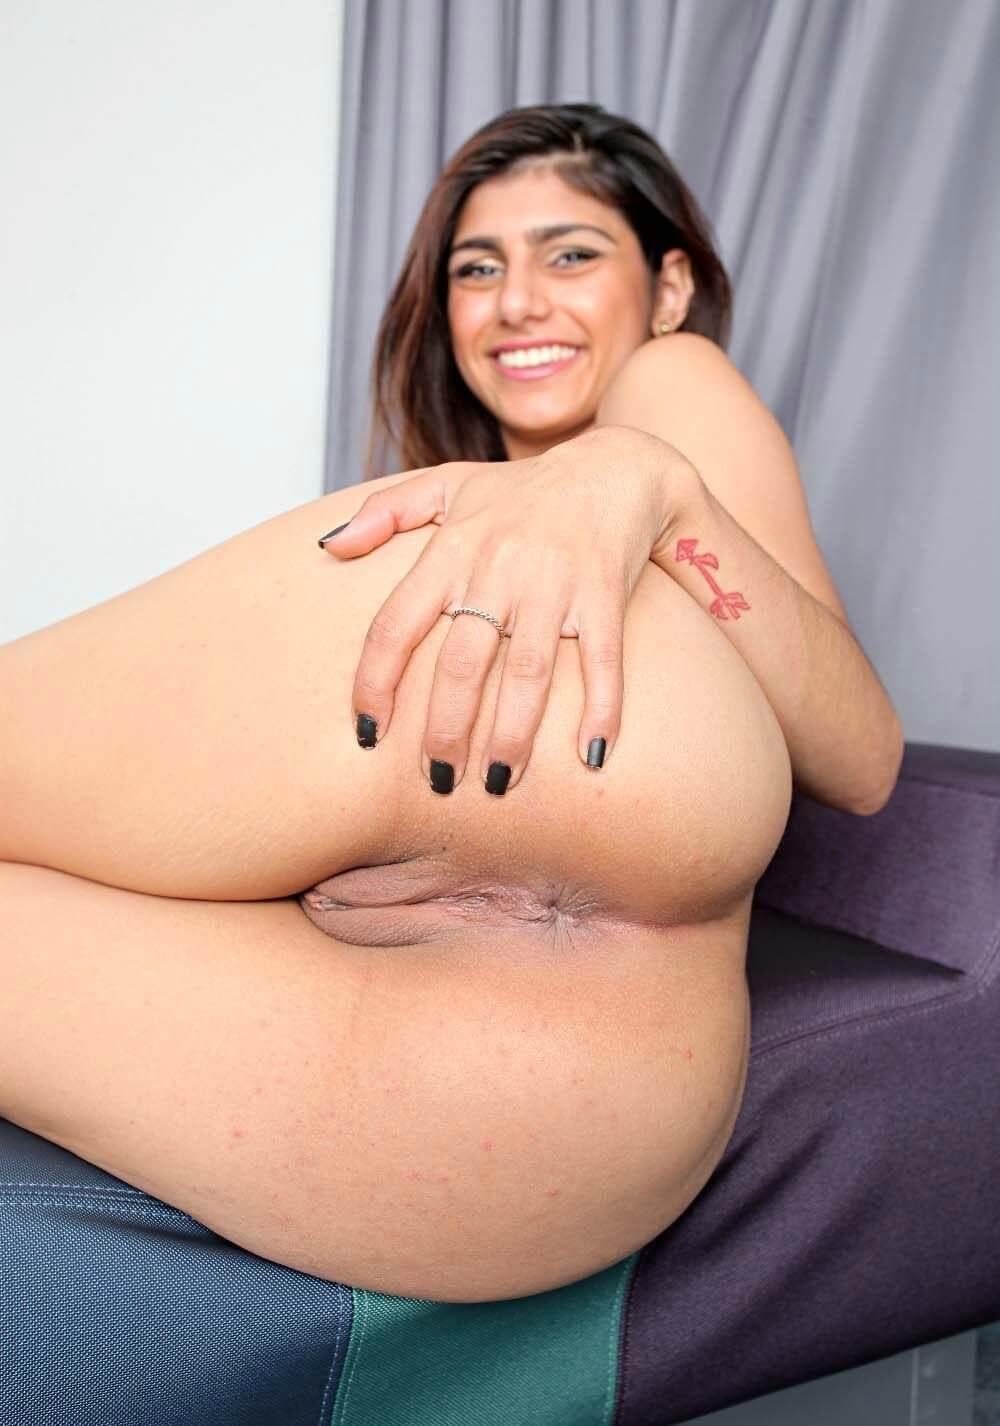 Mia Khalifa Porni